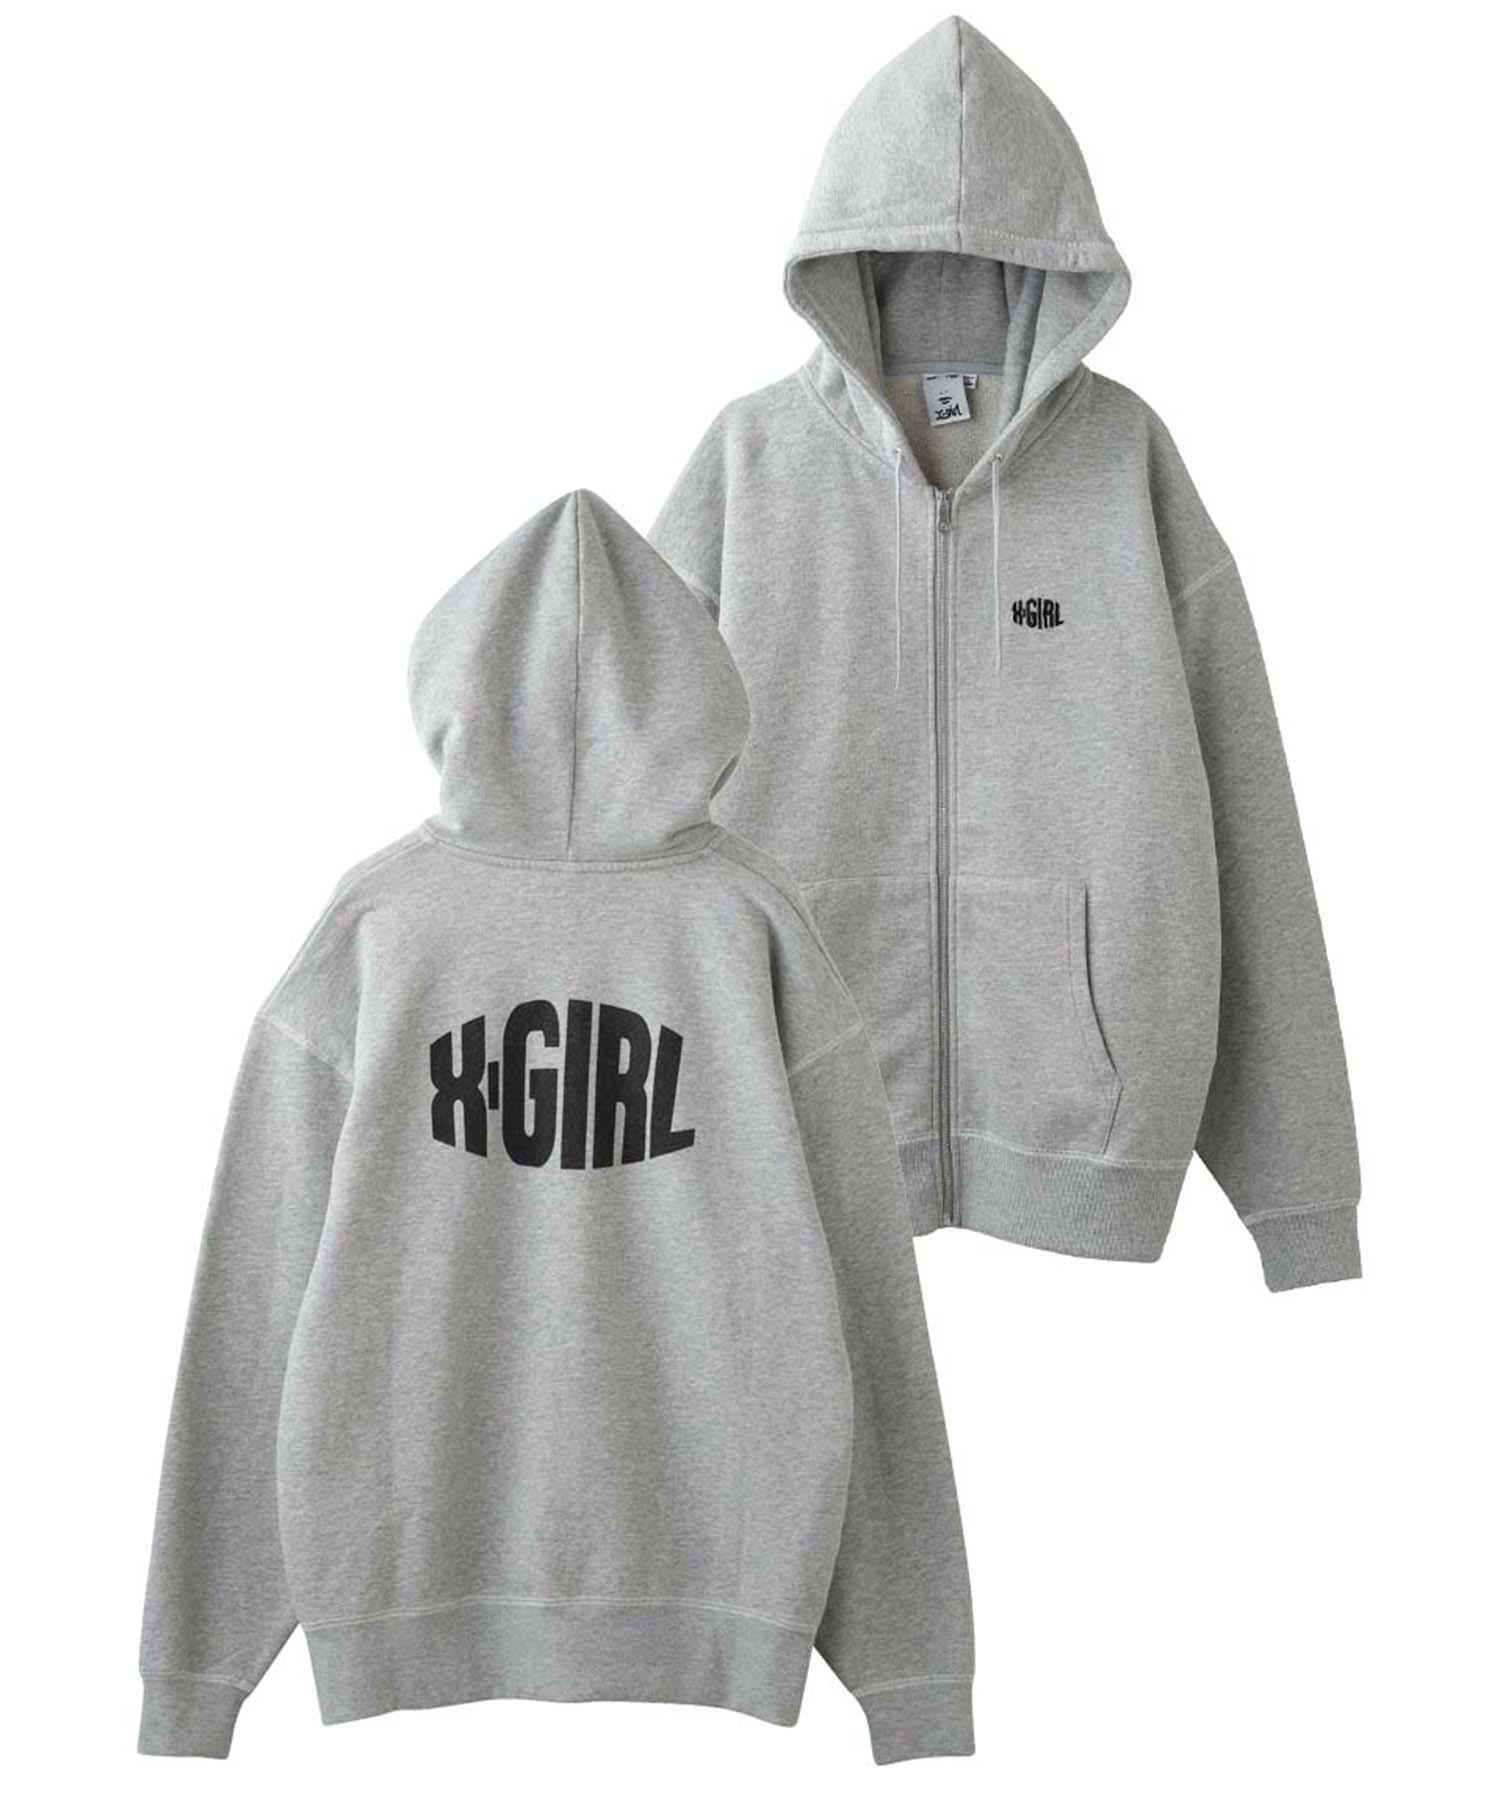 XGL01(エックスガール)通販 CURVED LOGO ZIP UP SWEAT HOODIE (アッシュ)